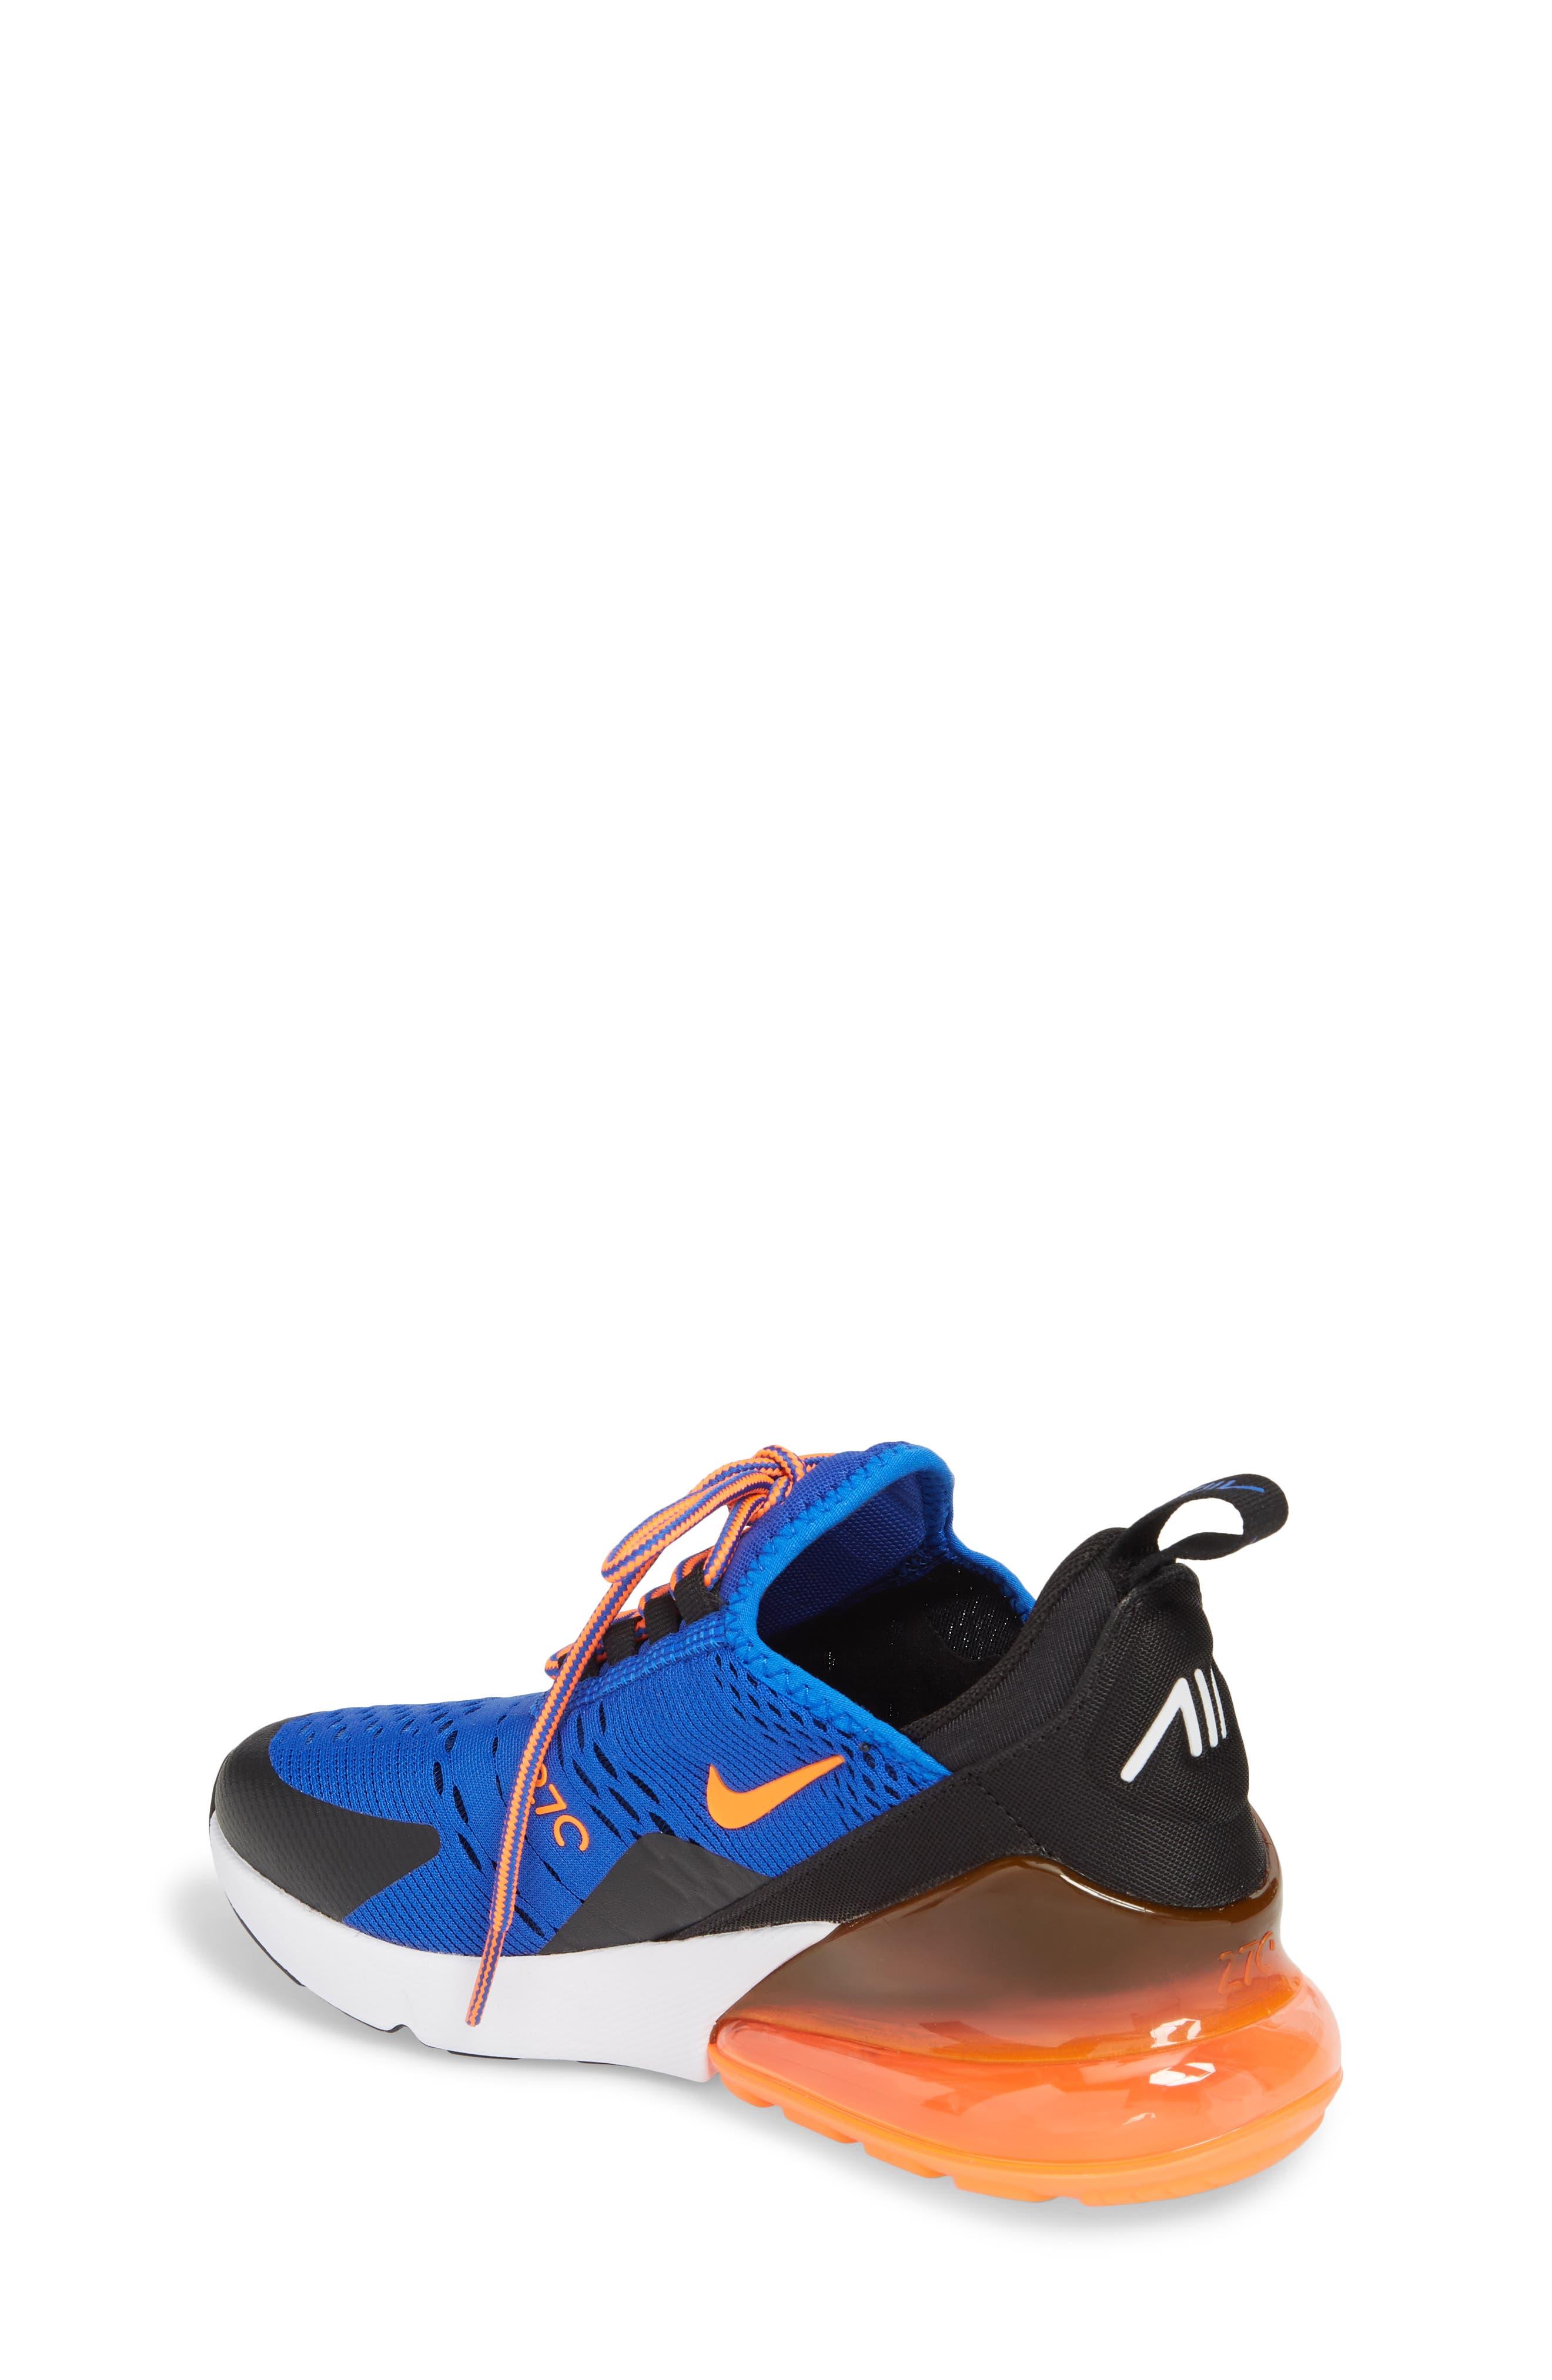 Air Max 270 Sneaker,                             Alternate thumbnail 2, color,                             Racer Blue/ Crimson/ Black